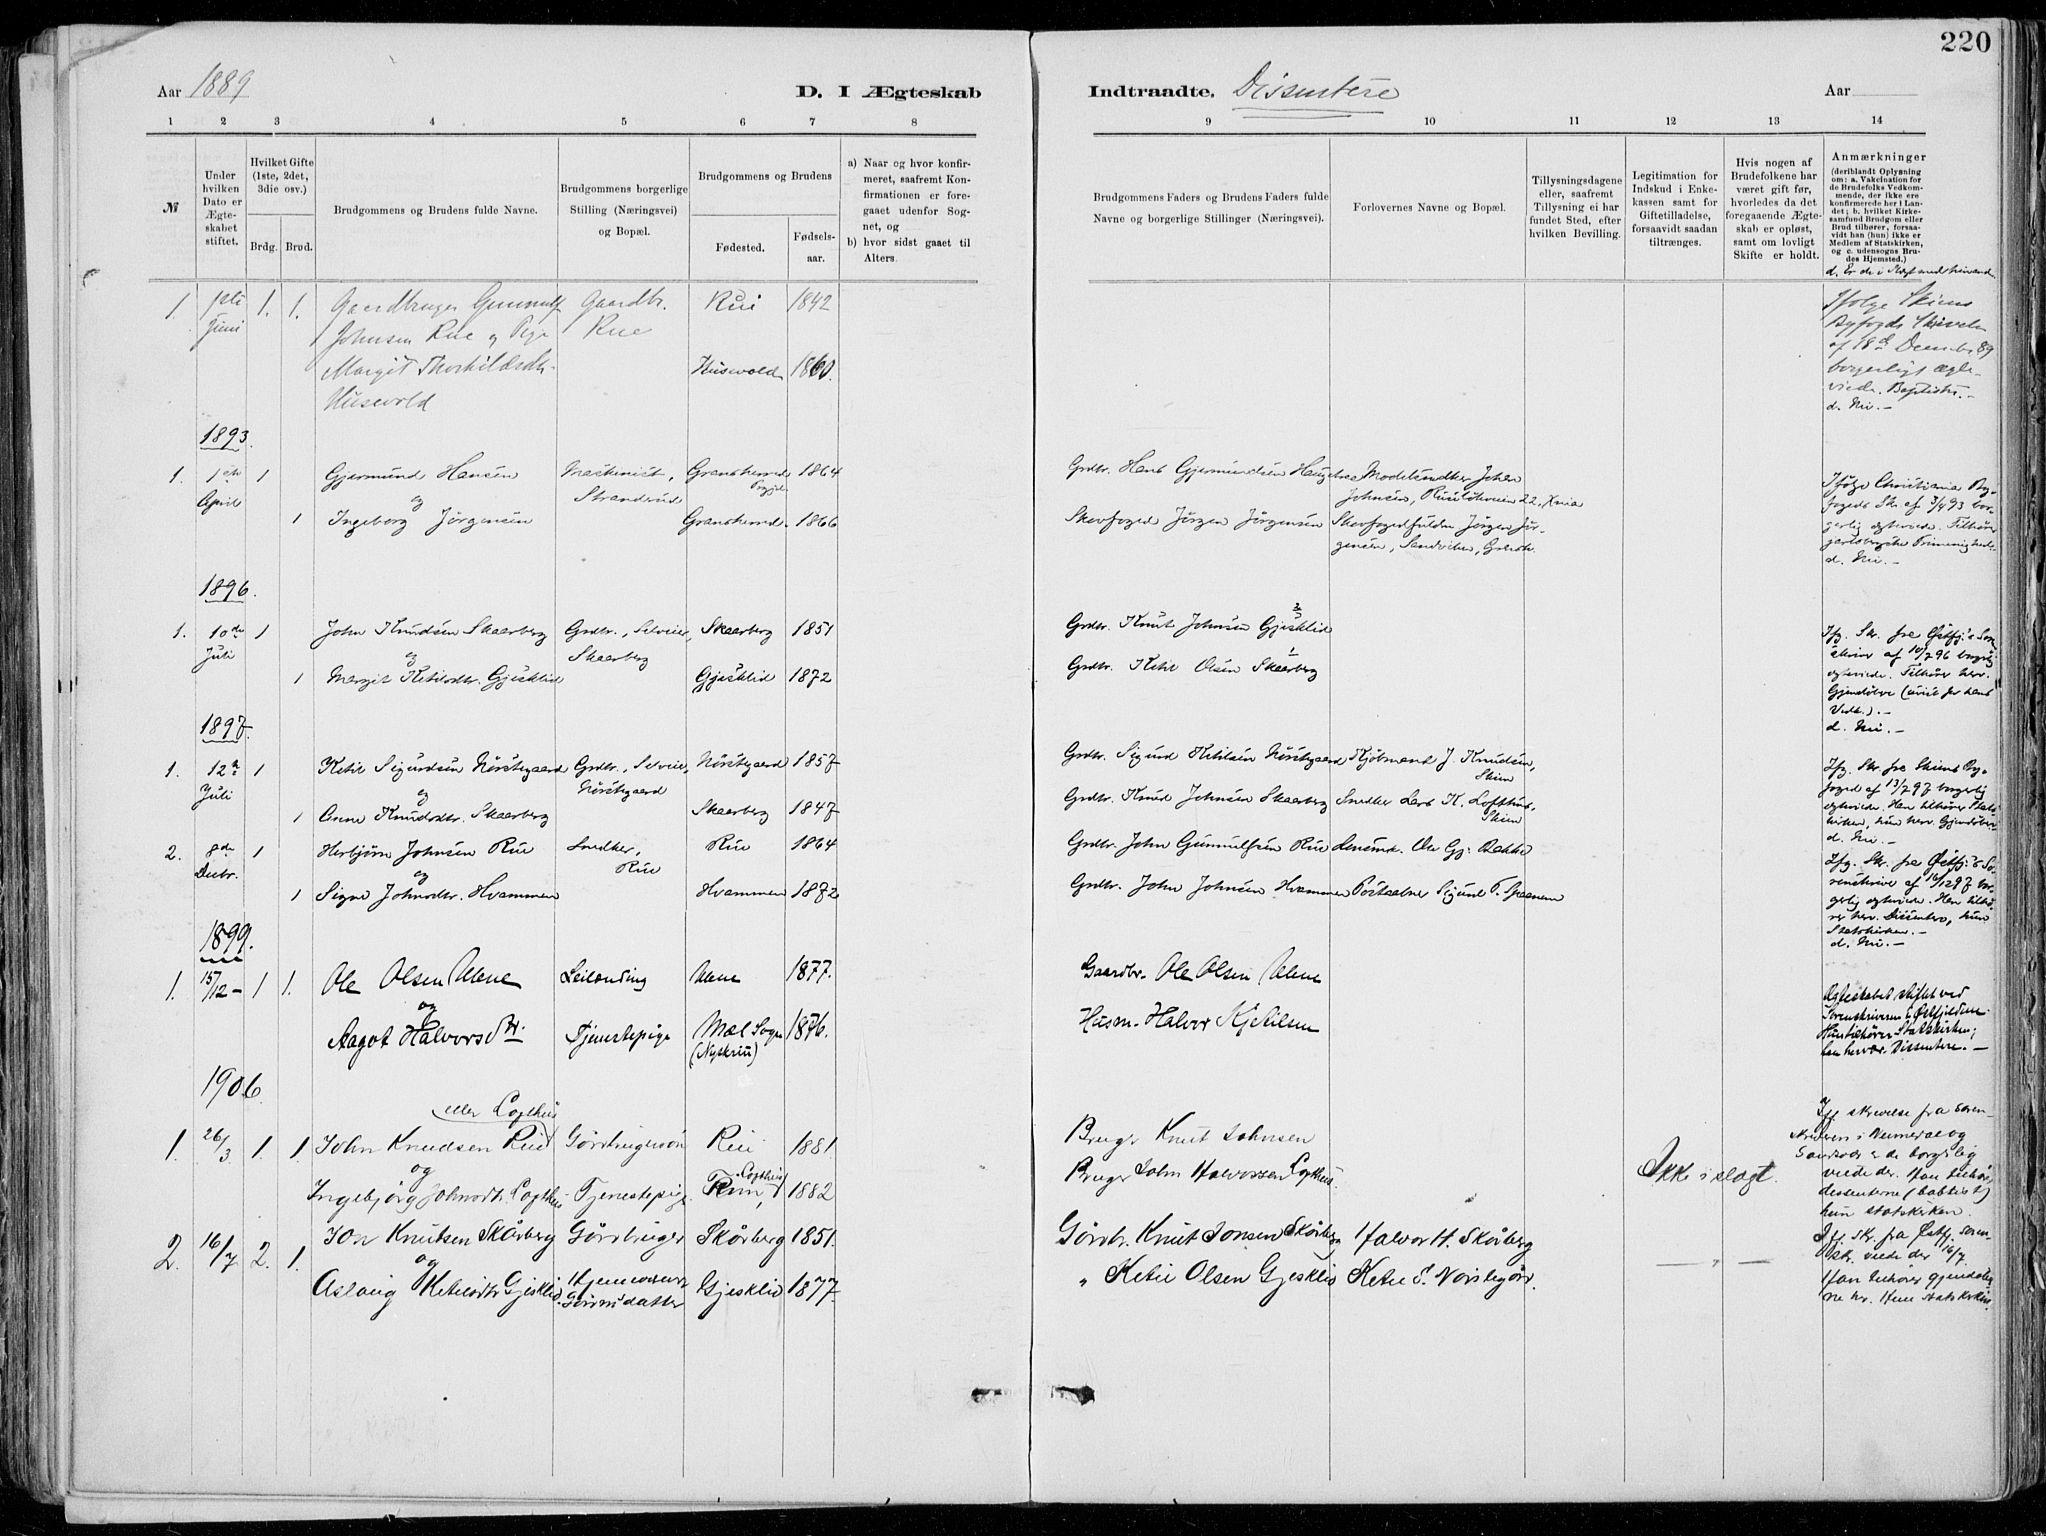 SAKO, Tinn kirkebøker, F/Fa/L0007: Ministerialbok nr. I 7, 1878-1922, s. 220